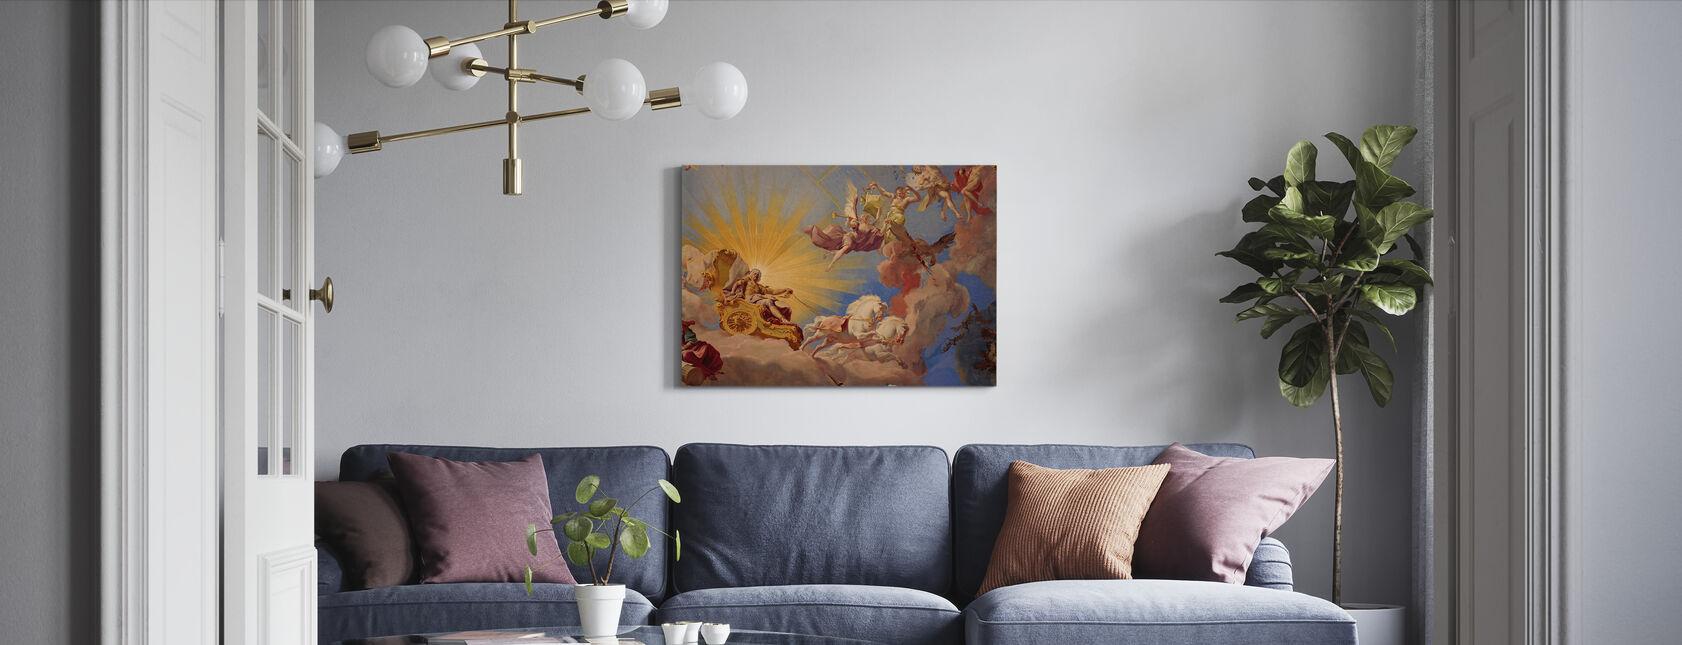 Ceiling Fresco Apotheosis of Emperor Karl VI - Canvas print - Living Room